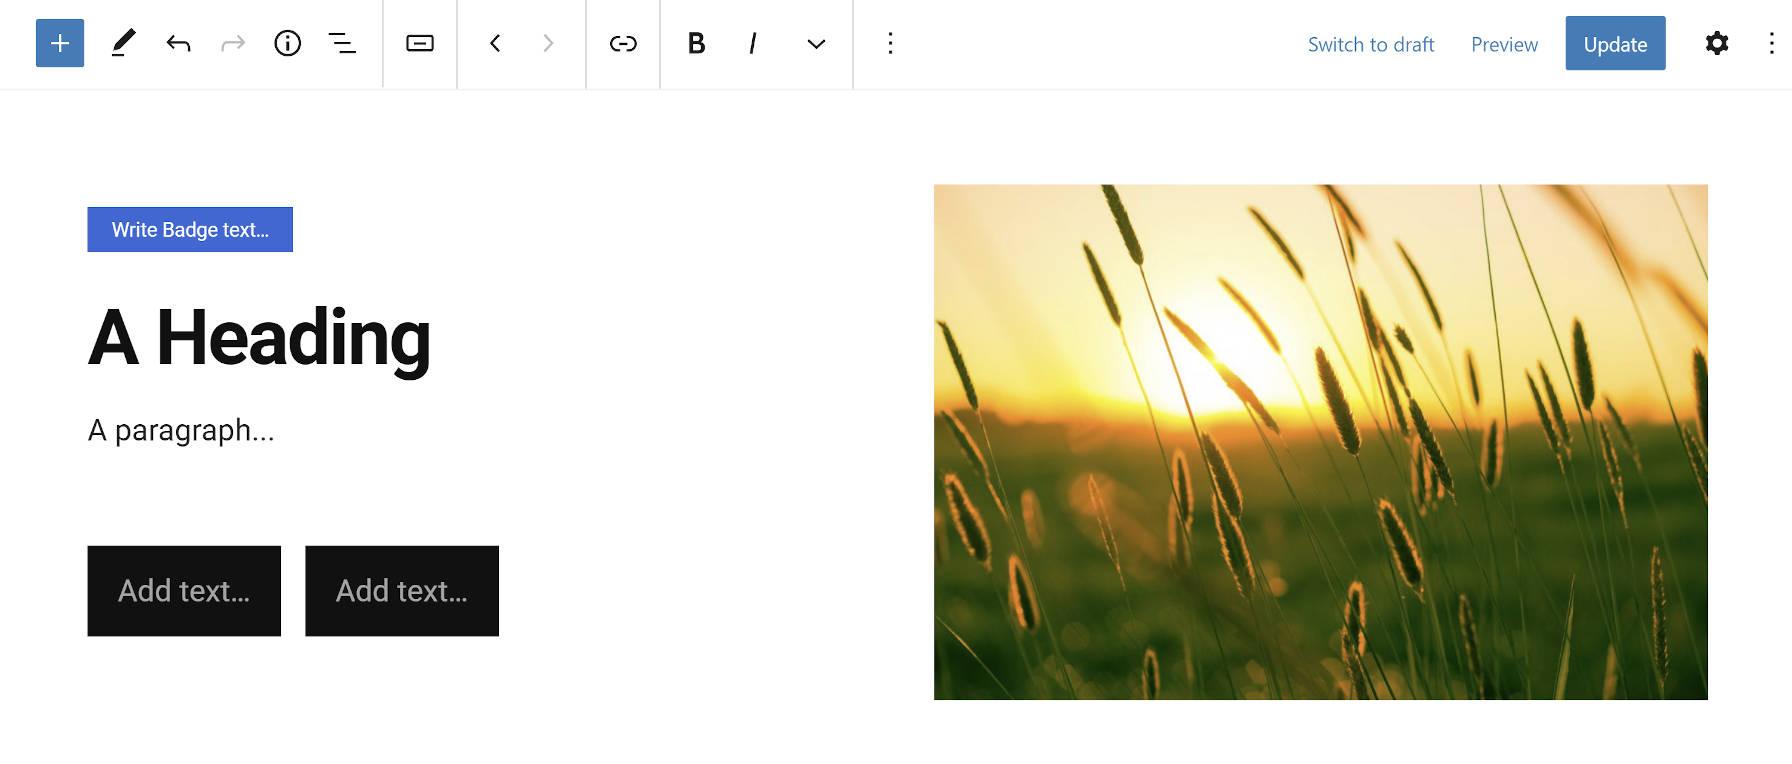 Beta版本发布一年后,elmastudios-aino-blocks-plugin-lands-in-plugin-directory-1 Beta发布一年后,Elmastudio的Aino阻止了Plugin进入插件目录